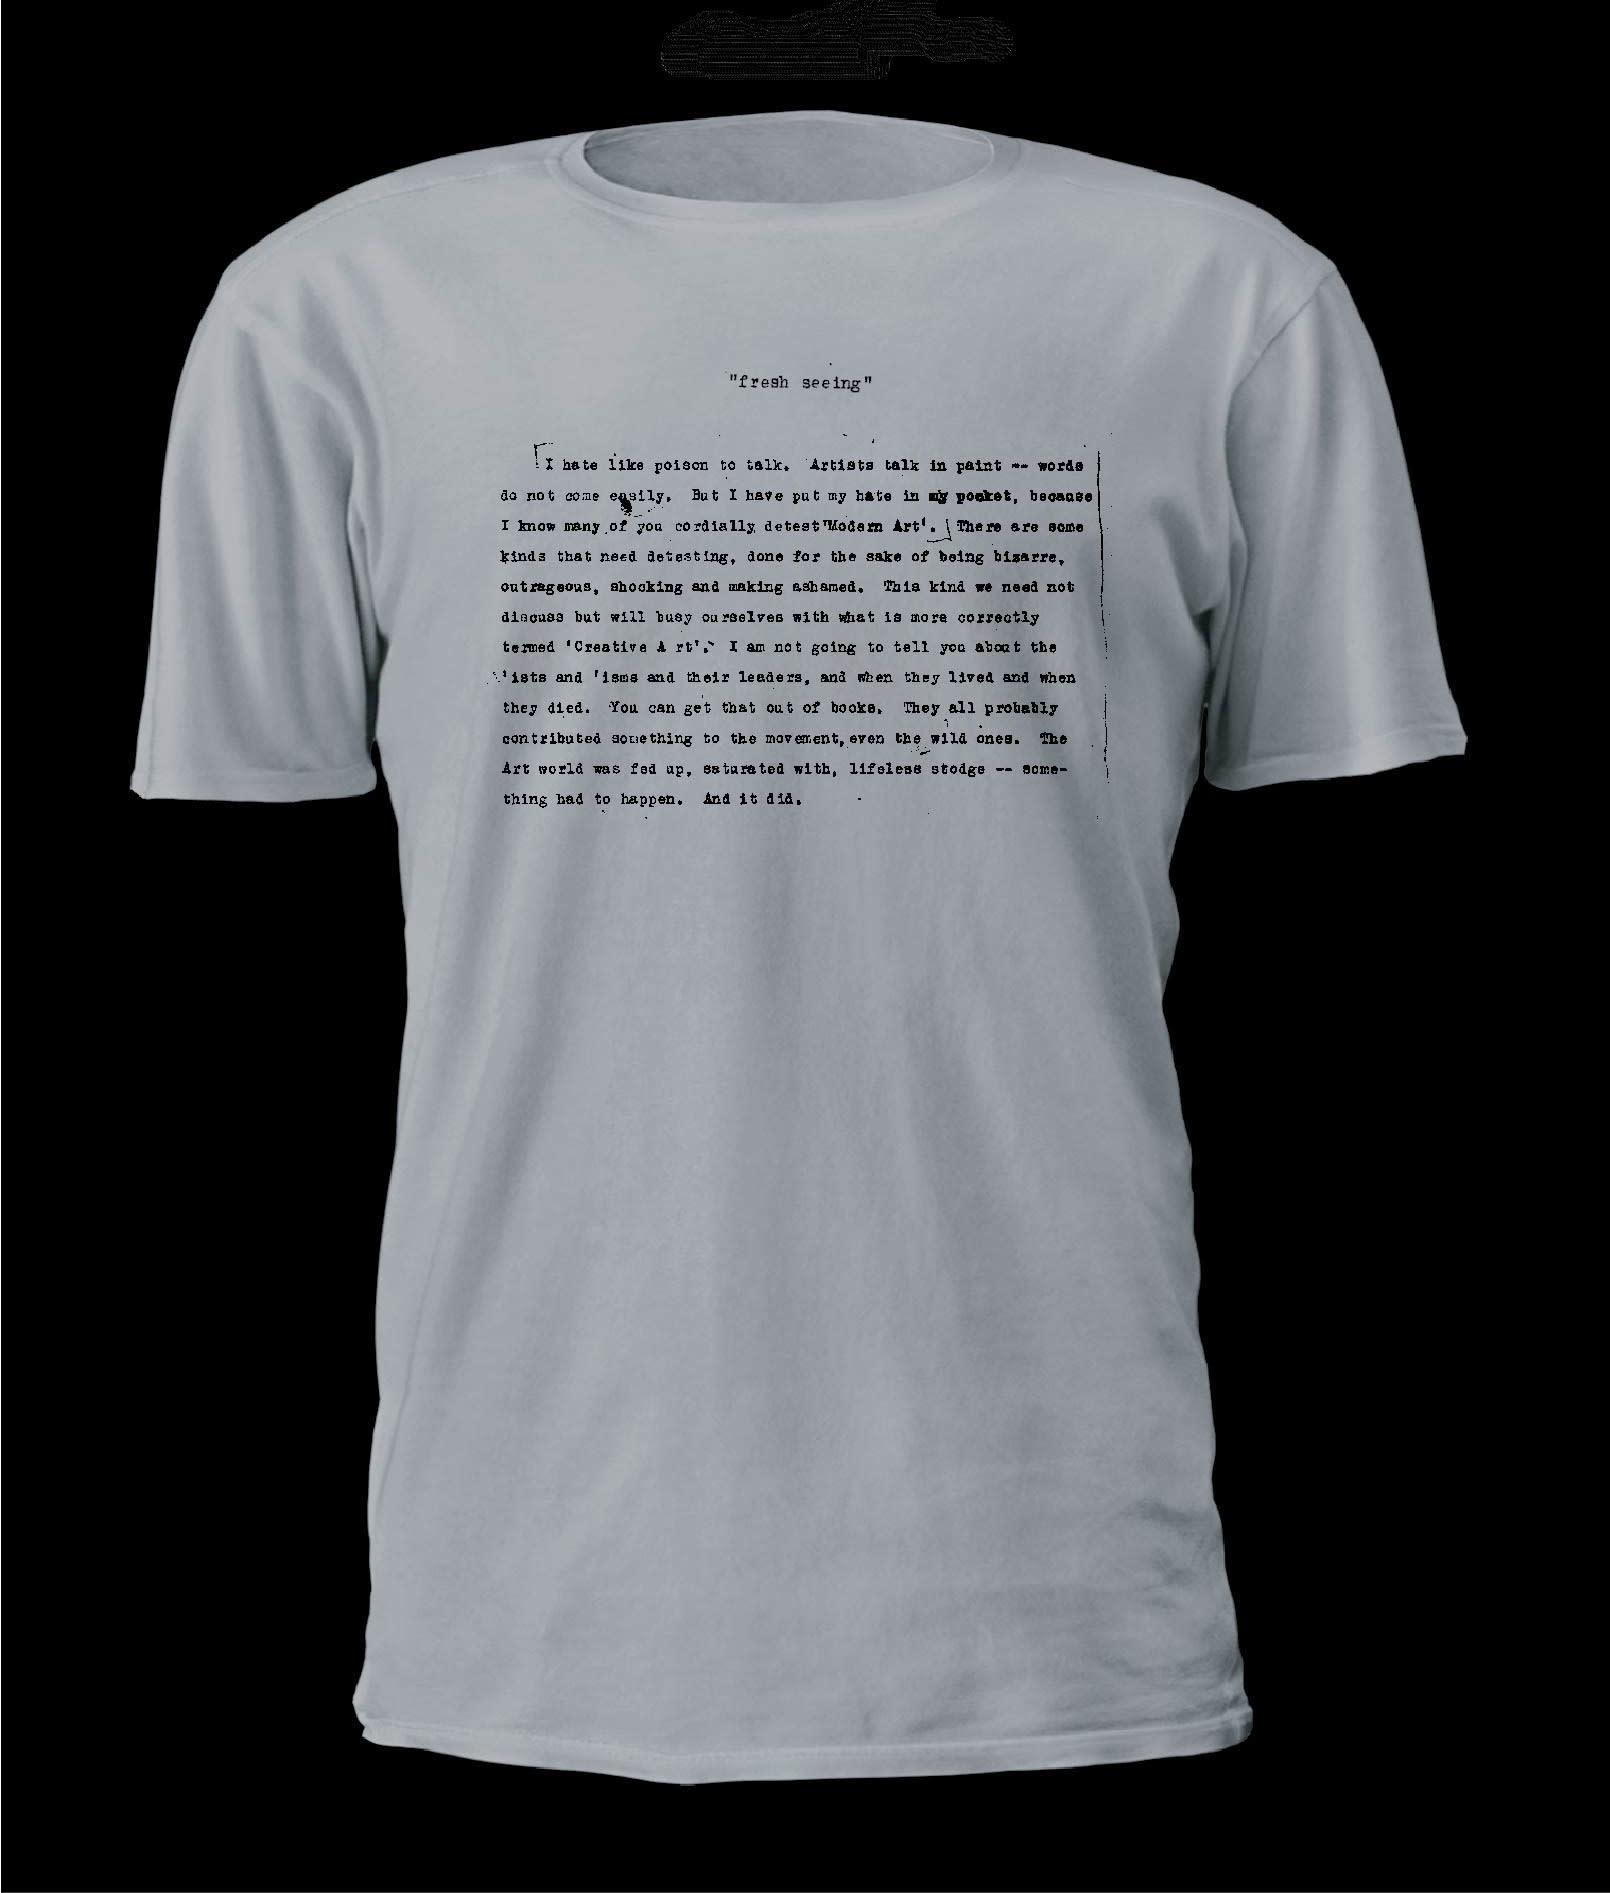 T-Shirt Emily Carr - Fresh Seeing